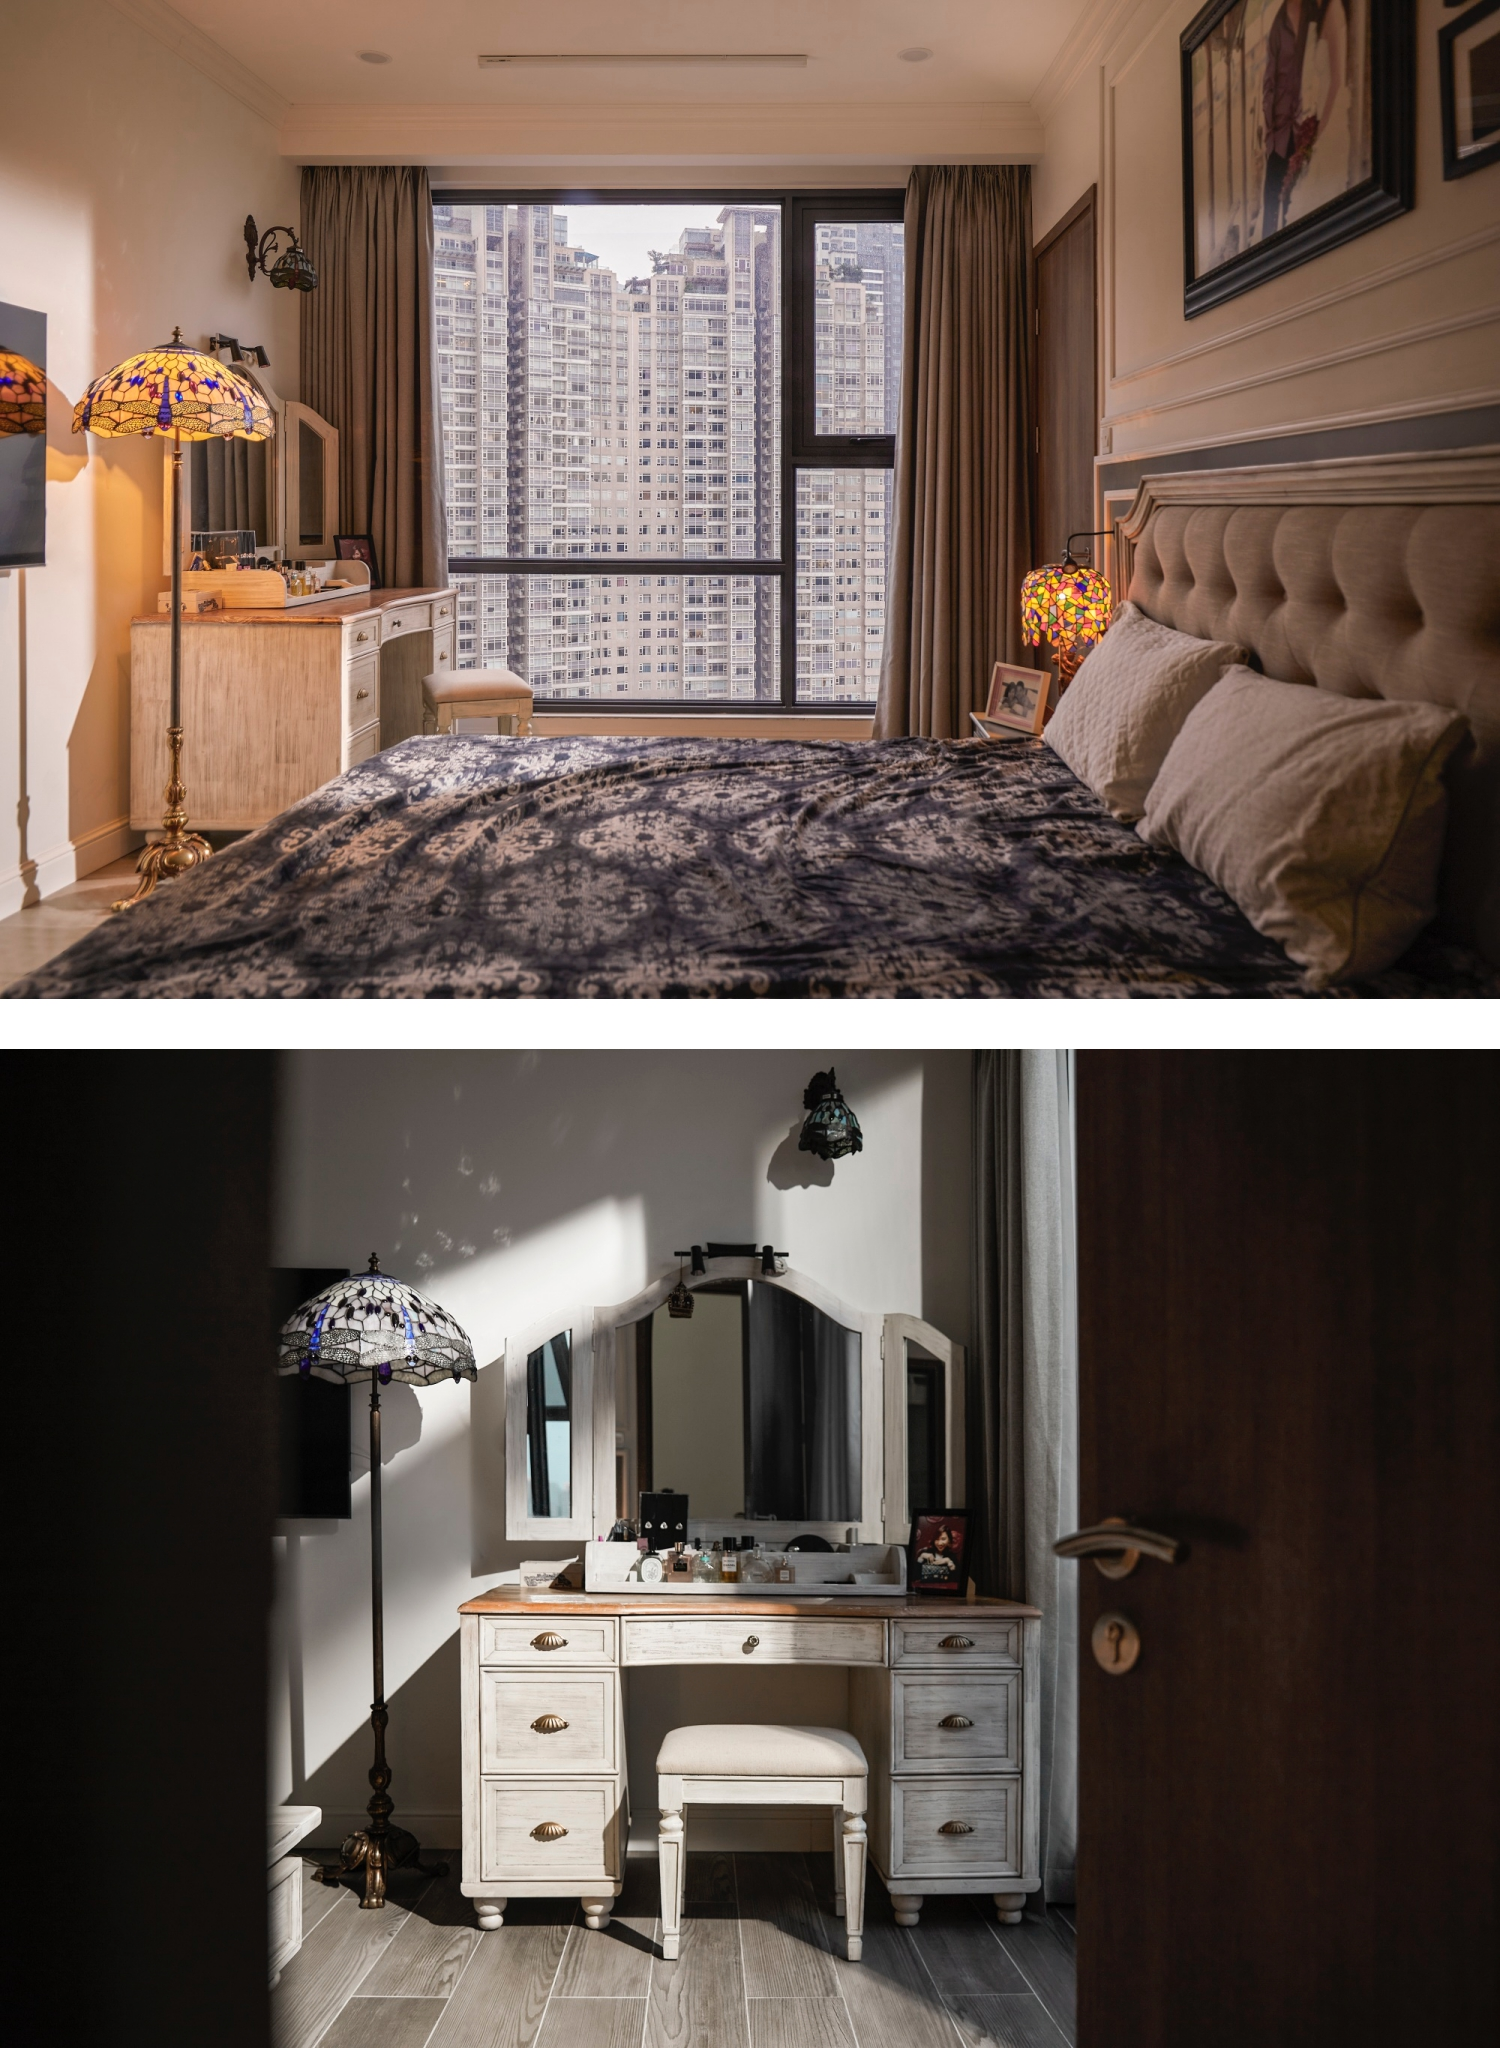 Hai căn hộ 90 m2 thông nhau qua một cánh cửa